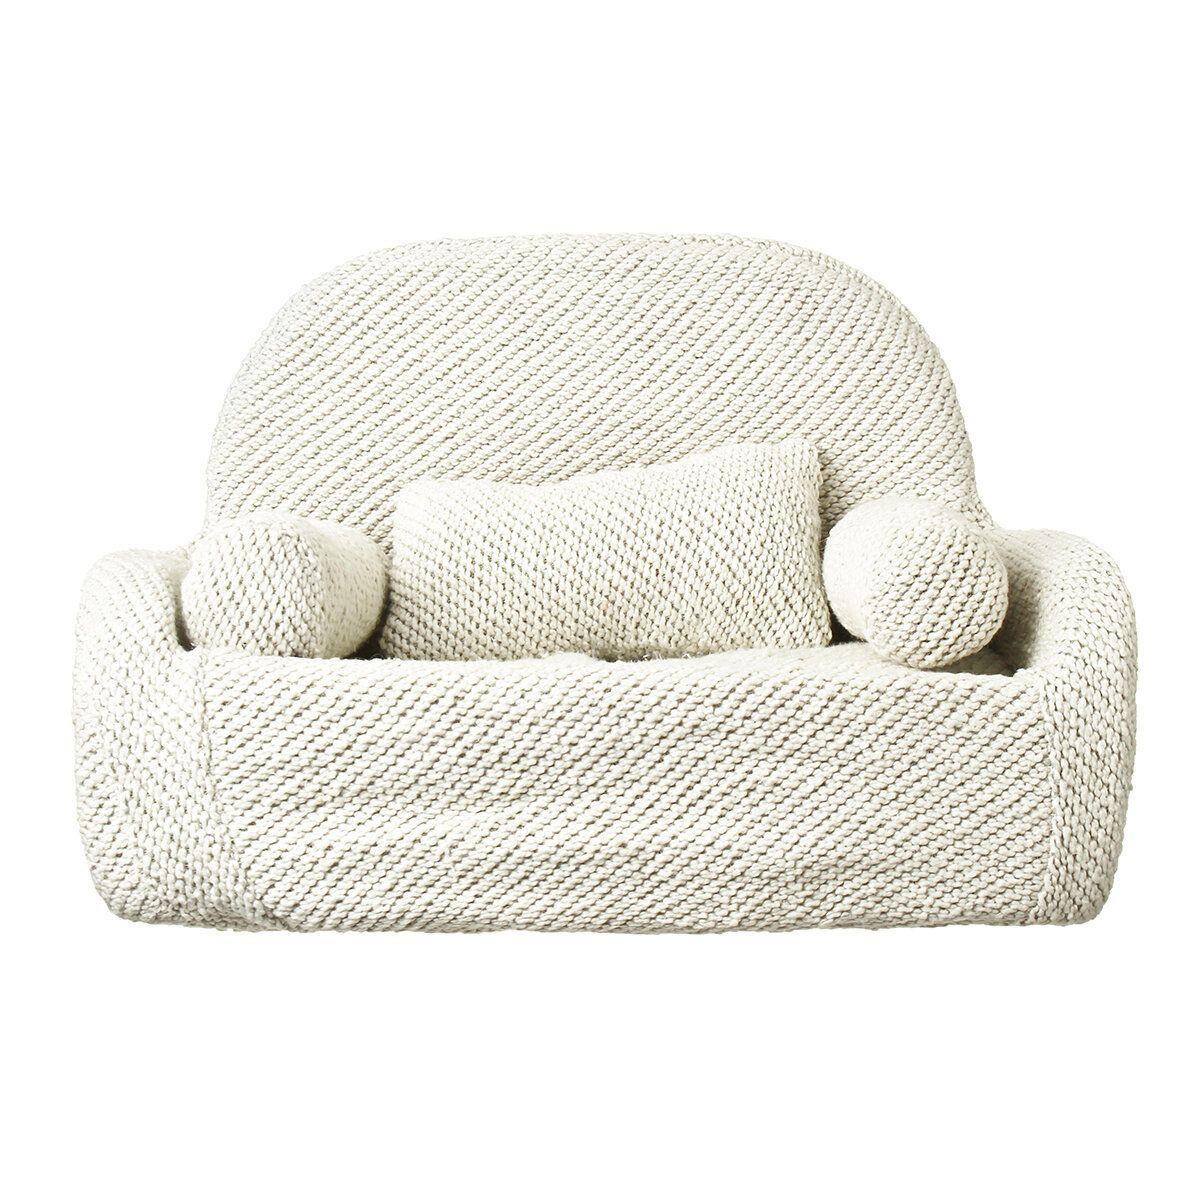 Newborn Baby Infant Sofa Chair Photography Prop Photo Studio Shooting Model Fabric Sofa